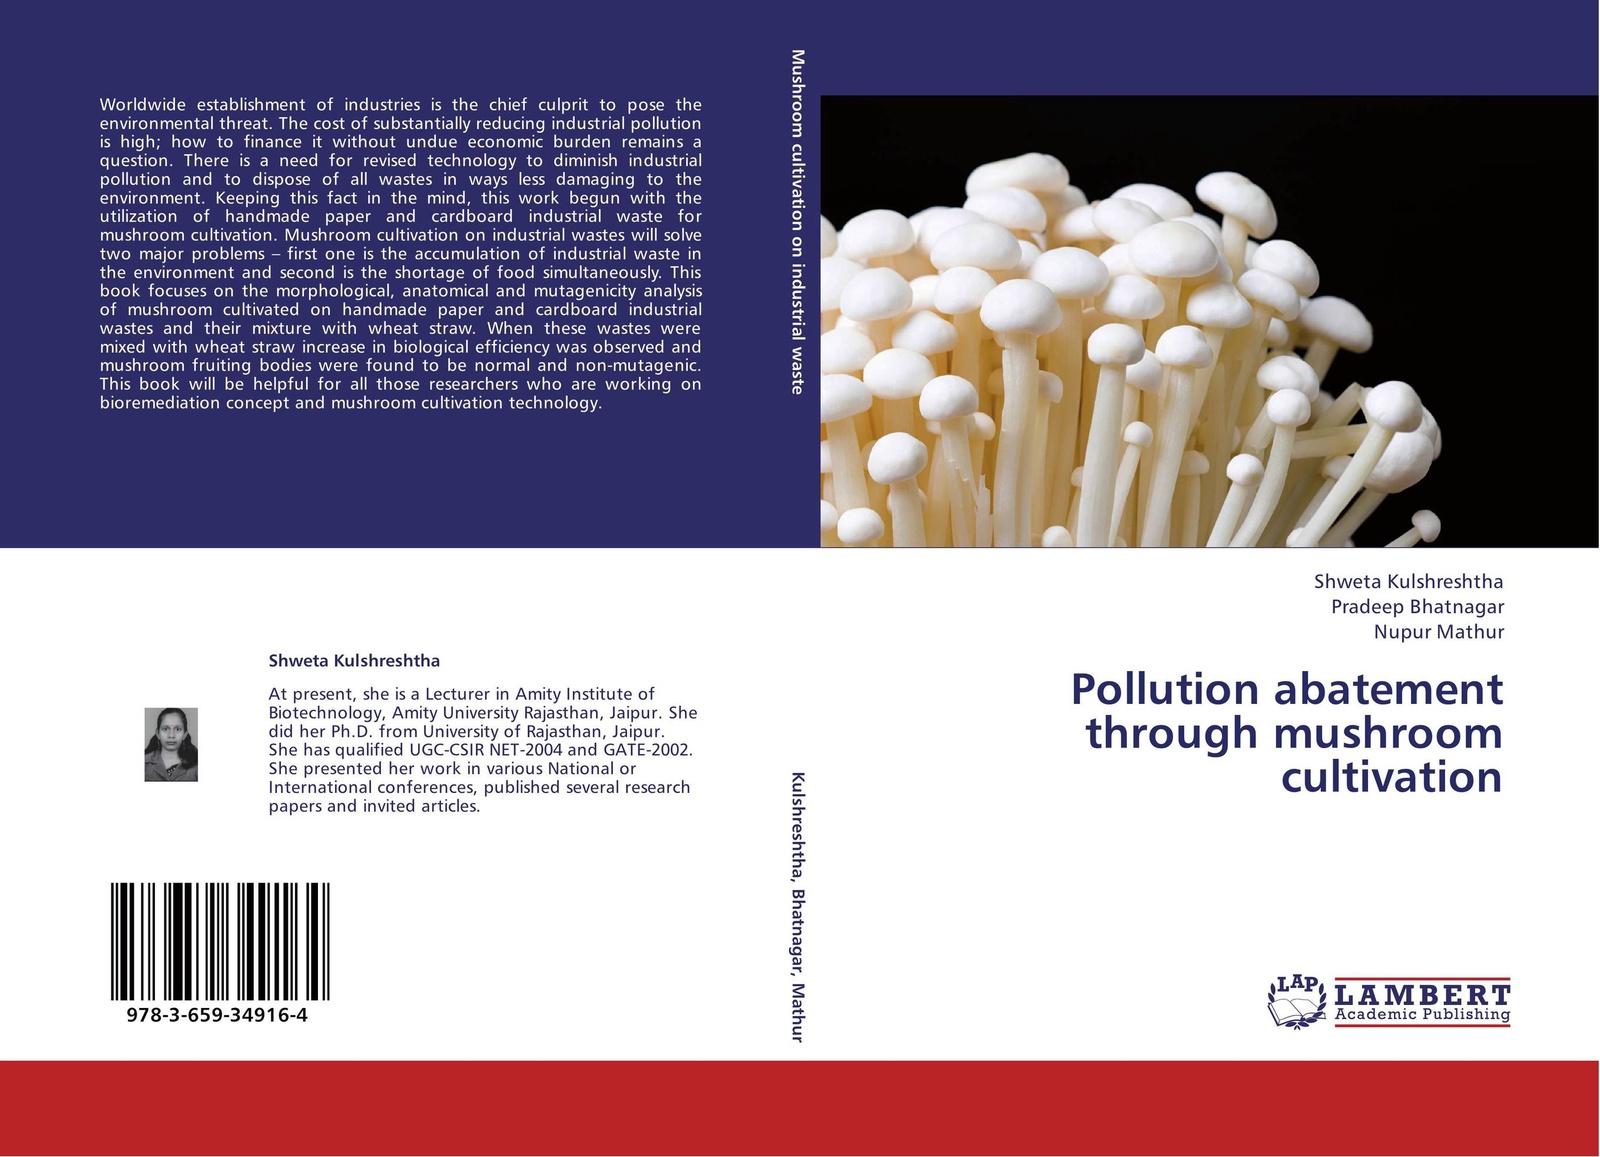 Shweta Kulshreshtha,Pradeep Bhatnagar and Nupur Mathur Pollution abatement through mushroom cultivation waya phutdhawong melissa agustin and weerachai phutdhawong utilization of palm oil mill wastes